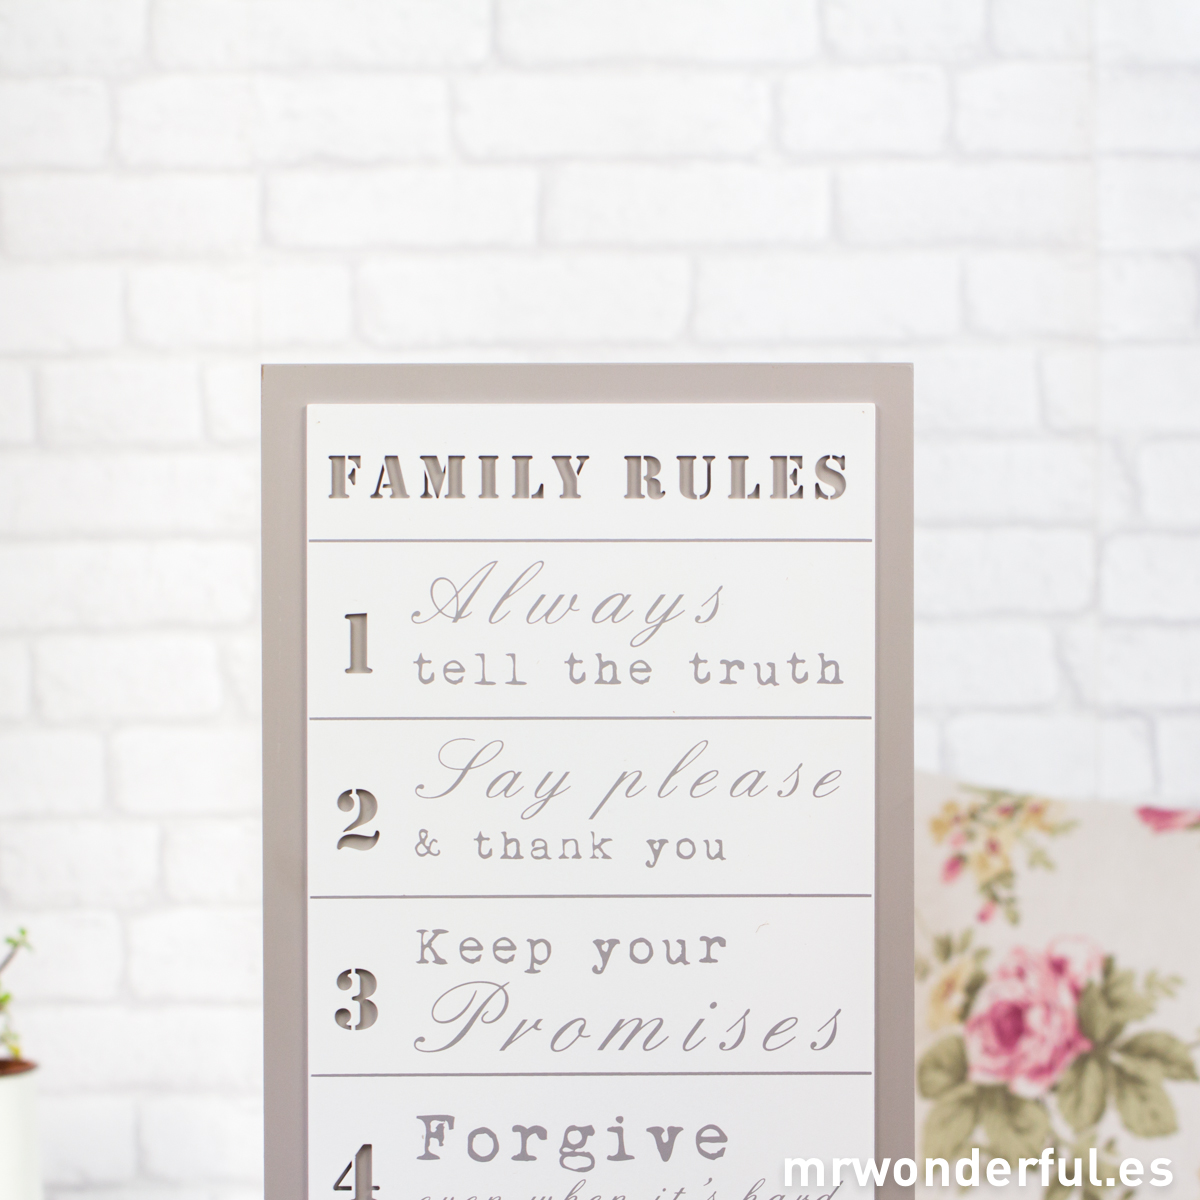 mrwonderful_WP1124_1_letrero-madera-family-rules-blanco-fondo-gris-13